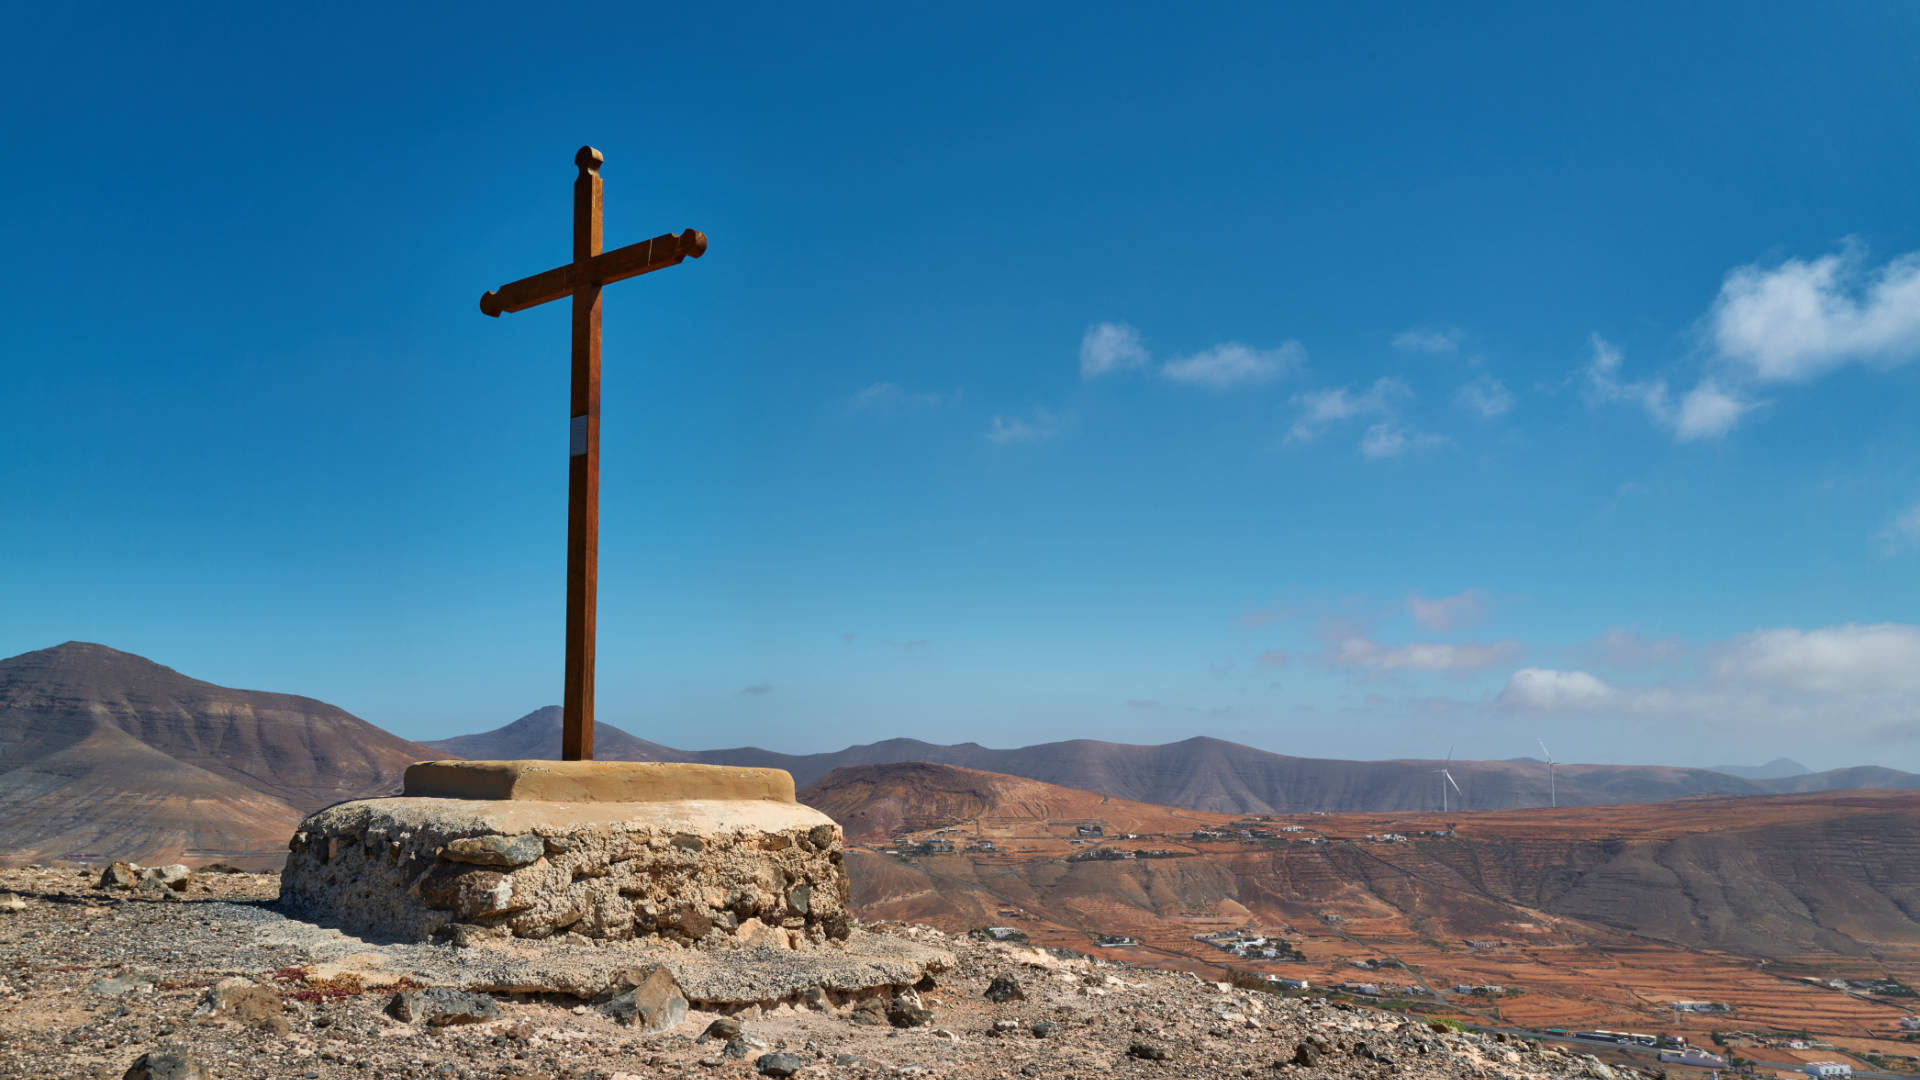 Montaña San Andrés Tetir Fuerteventura.